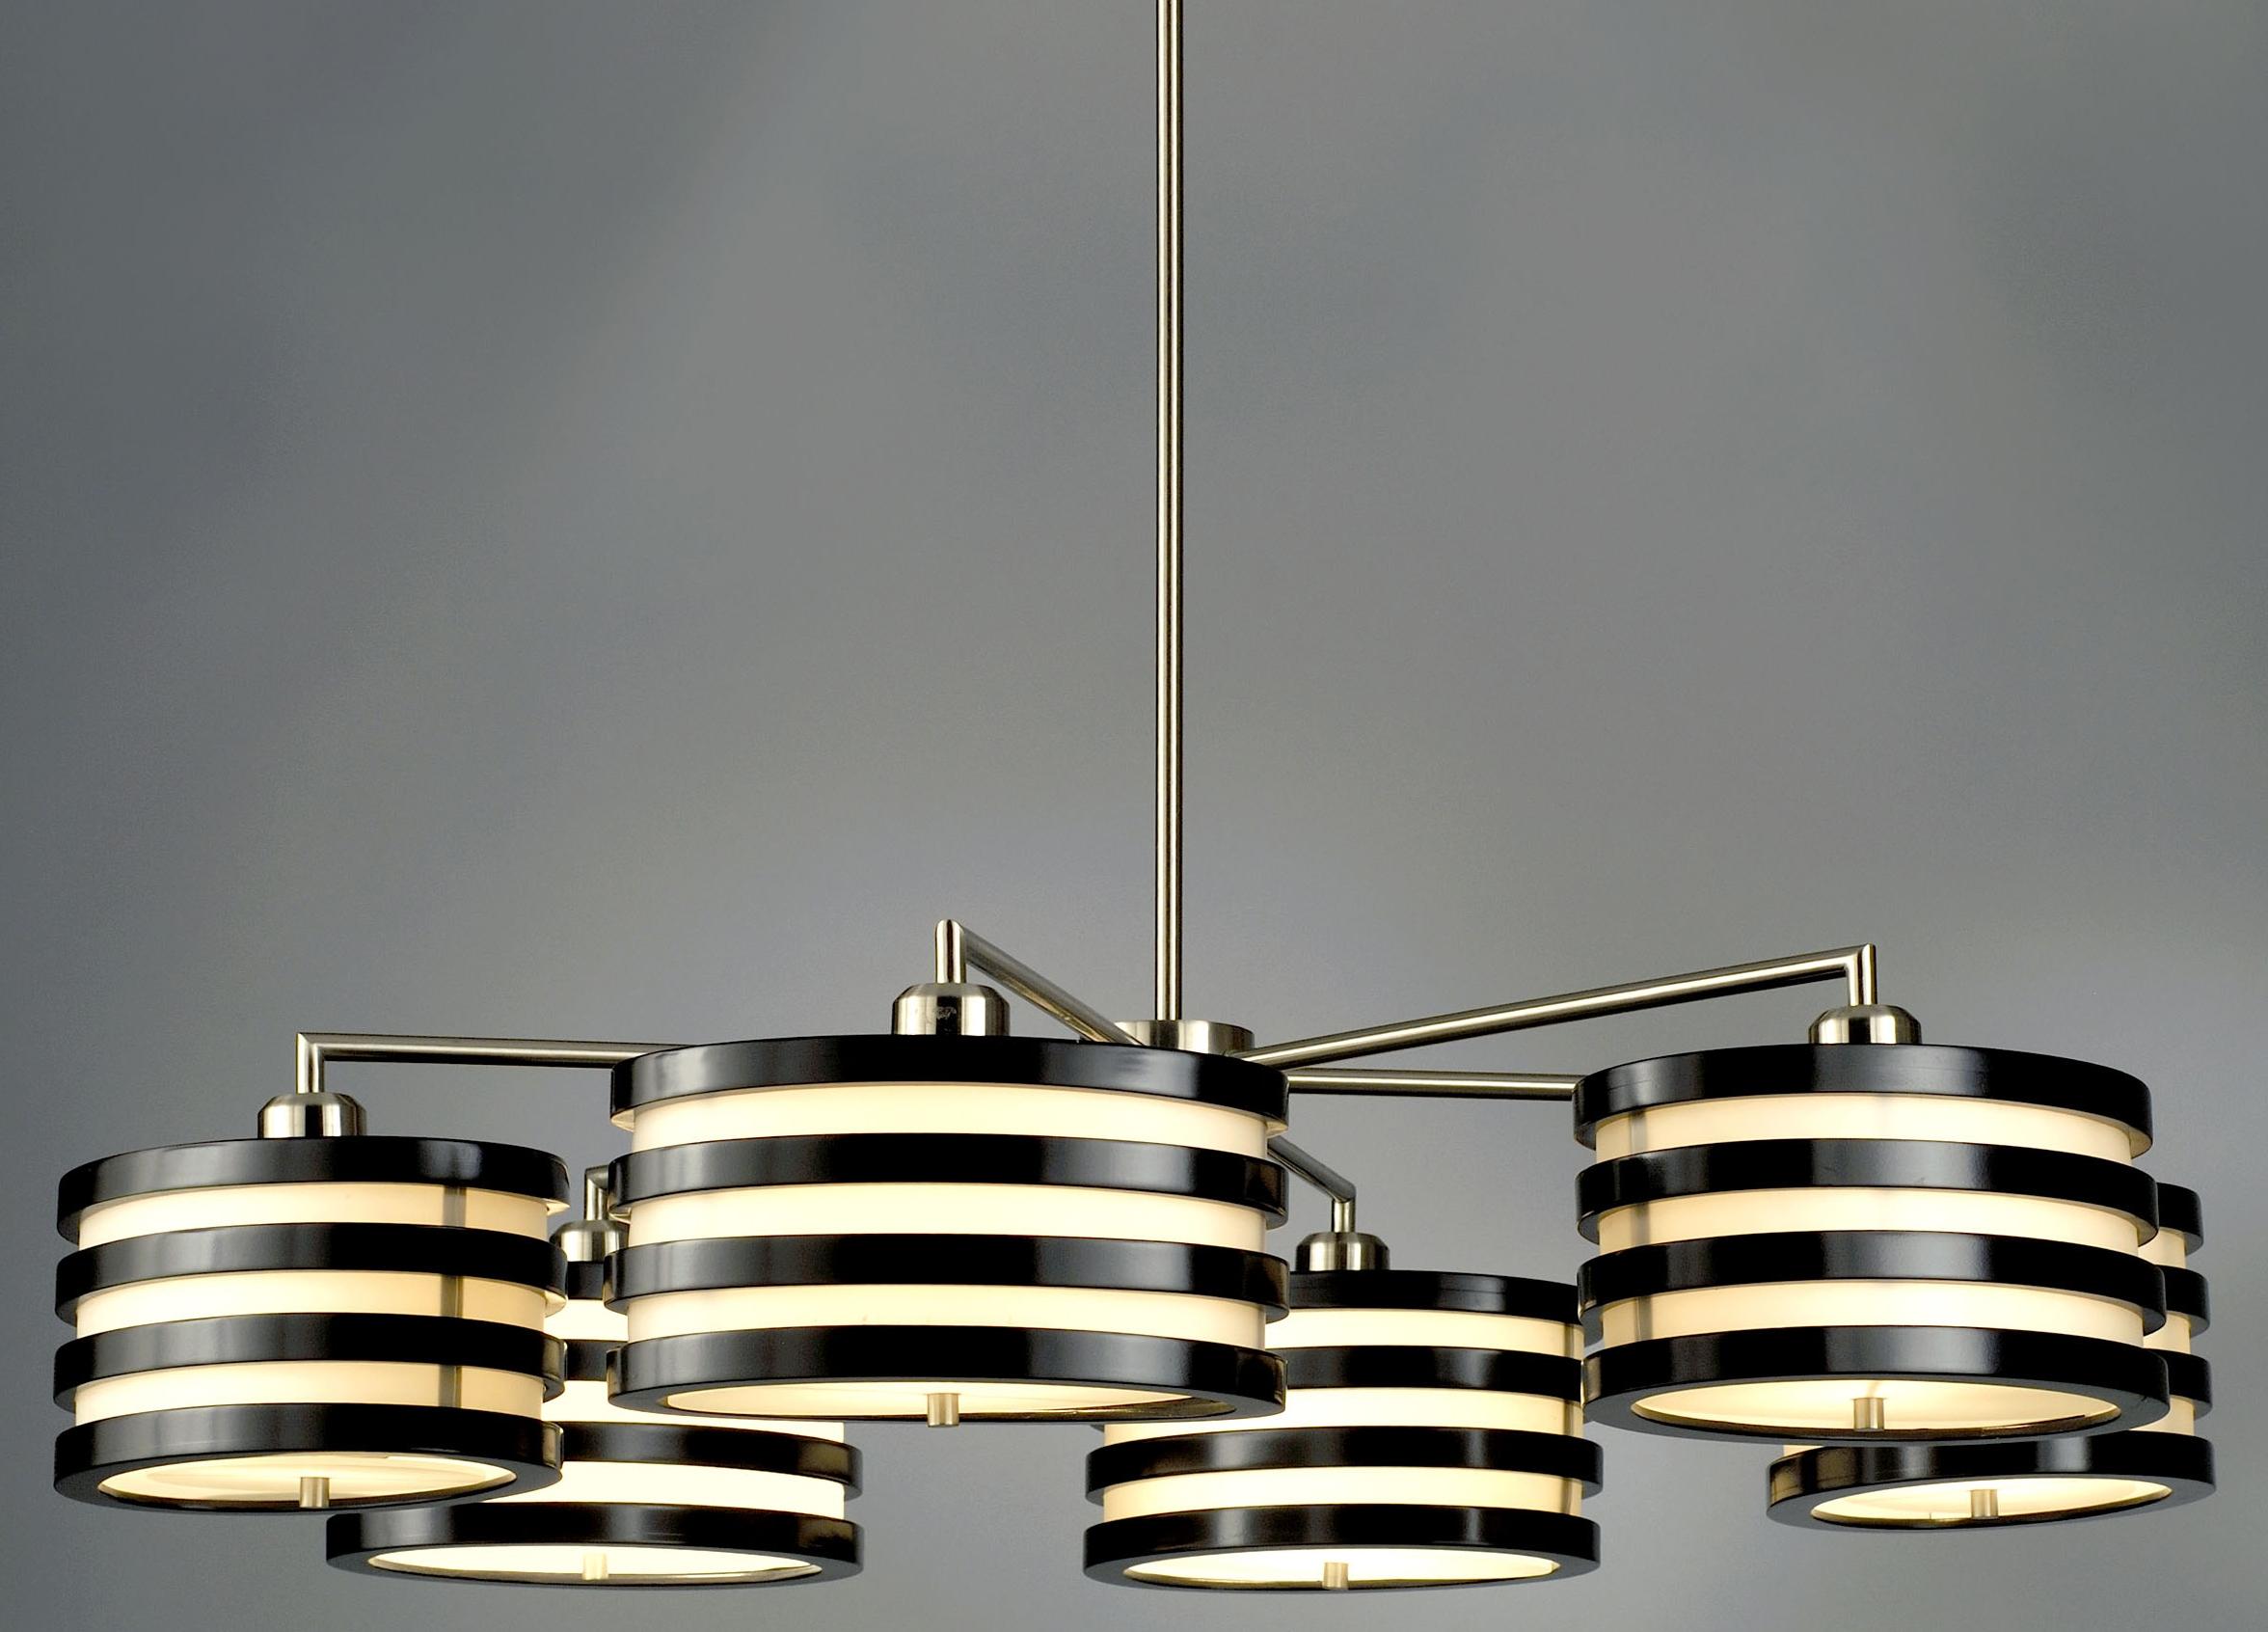 Modern Chandelier Light Fixtures Alexsullivanfund Intended For Contemporary Modern Chandelier (#12 of 12)